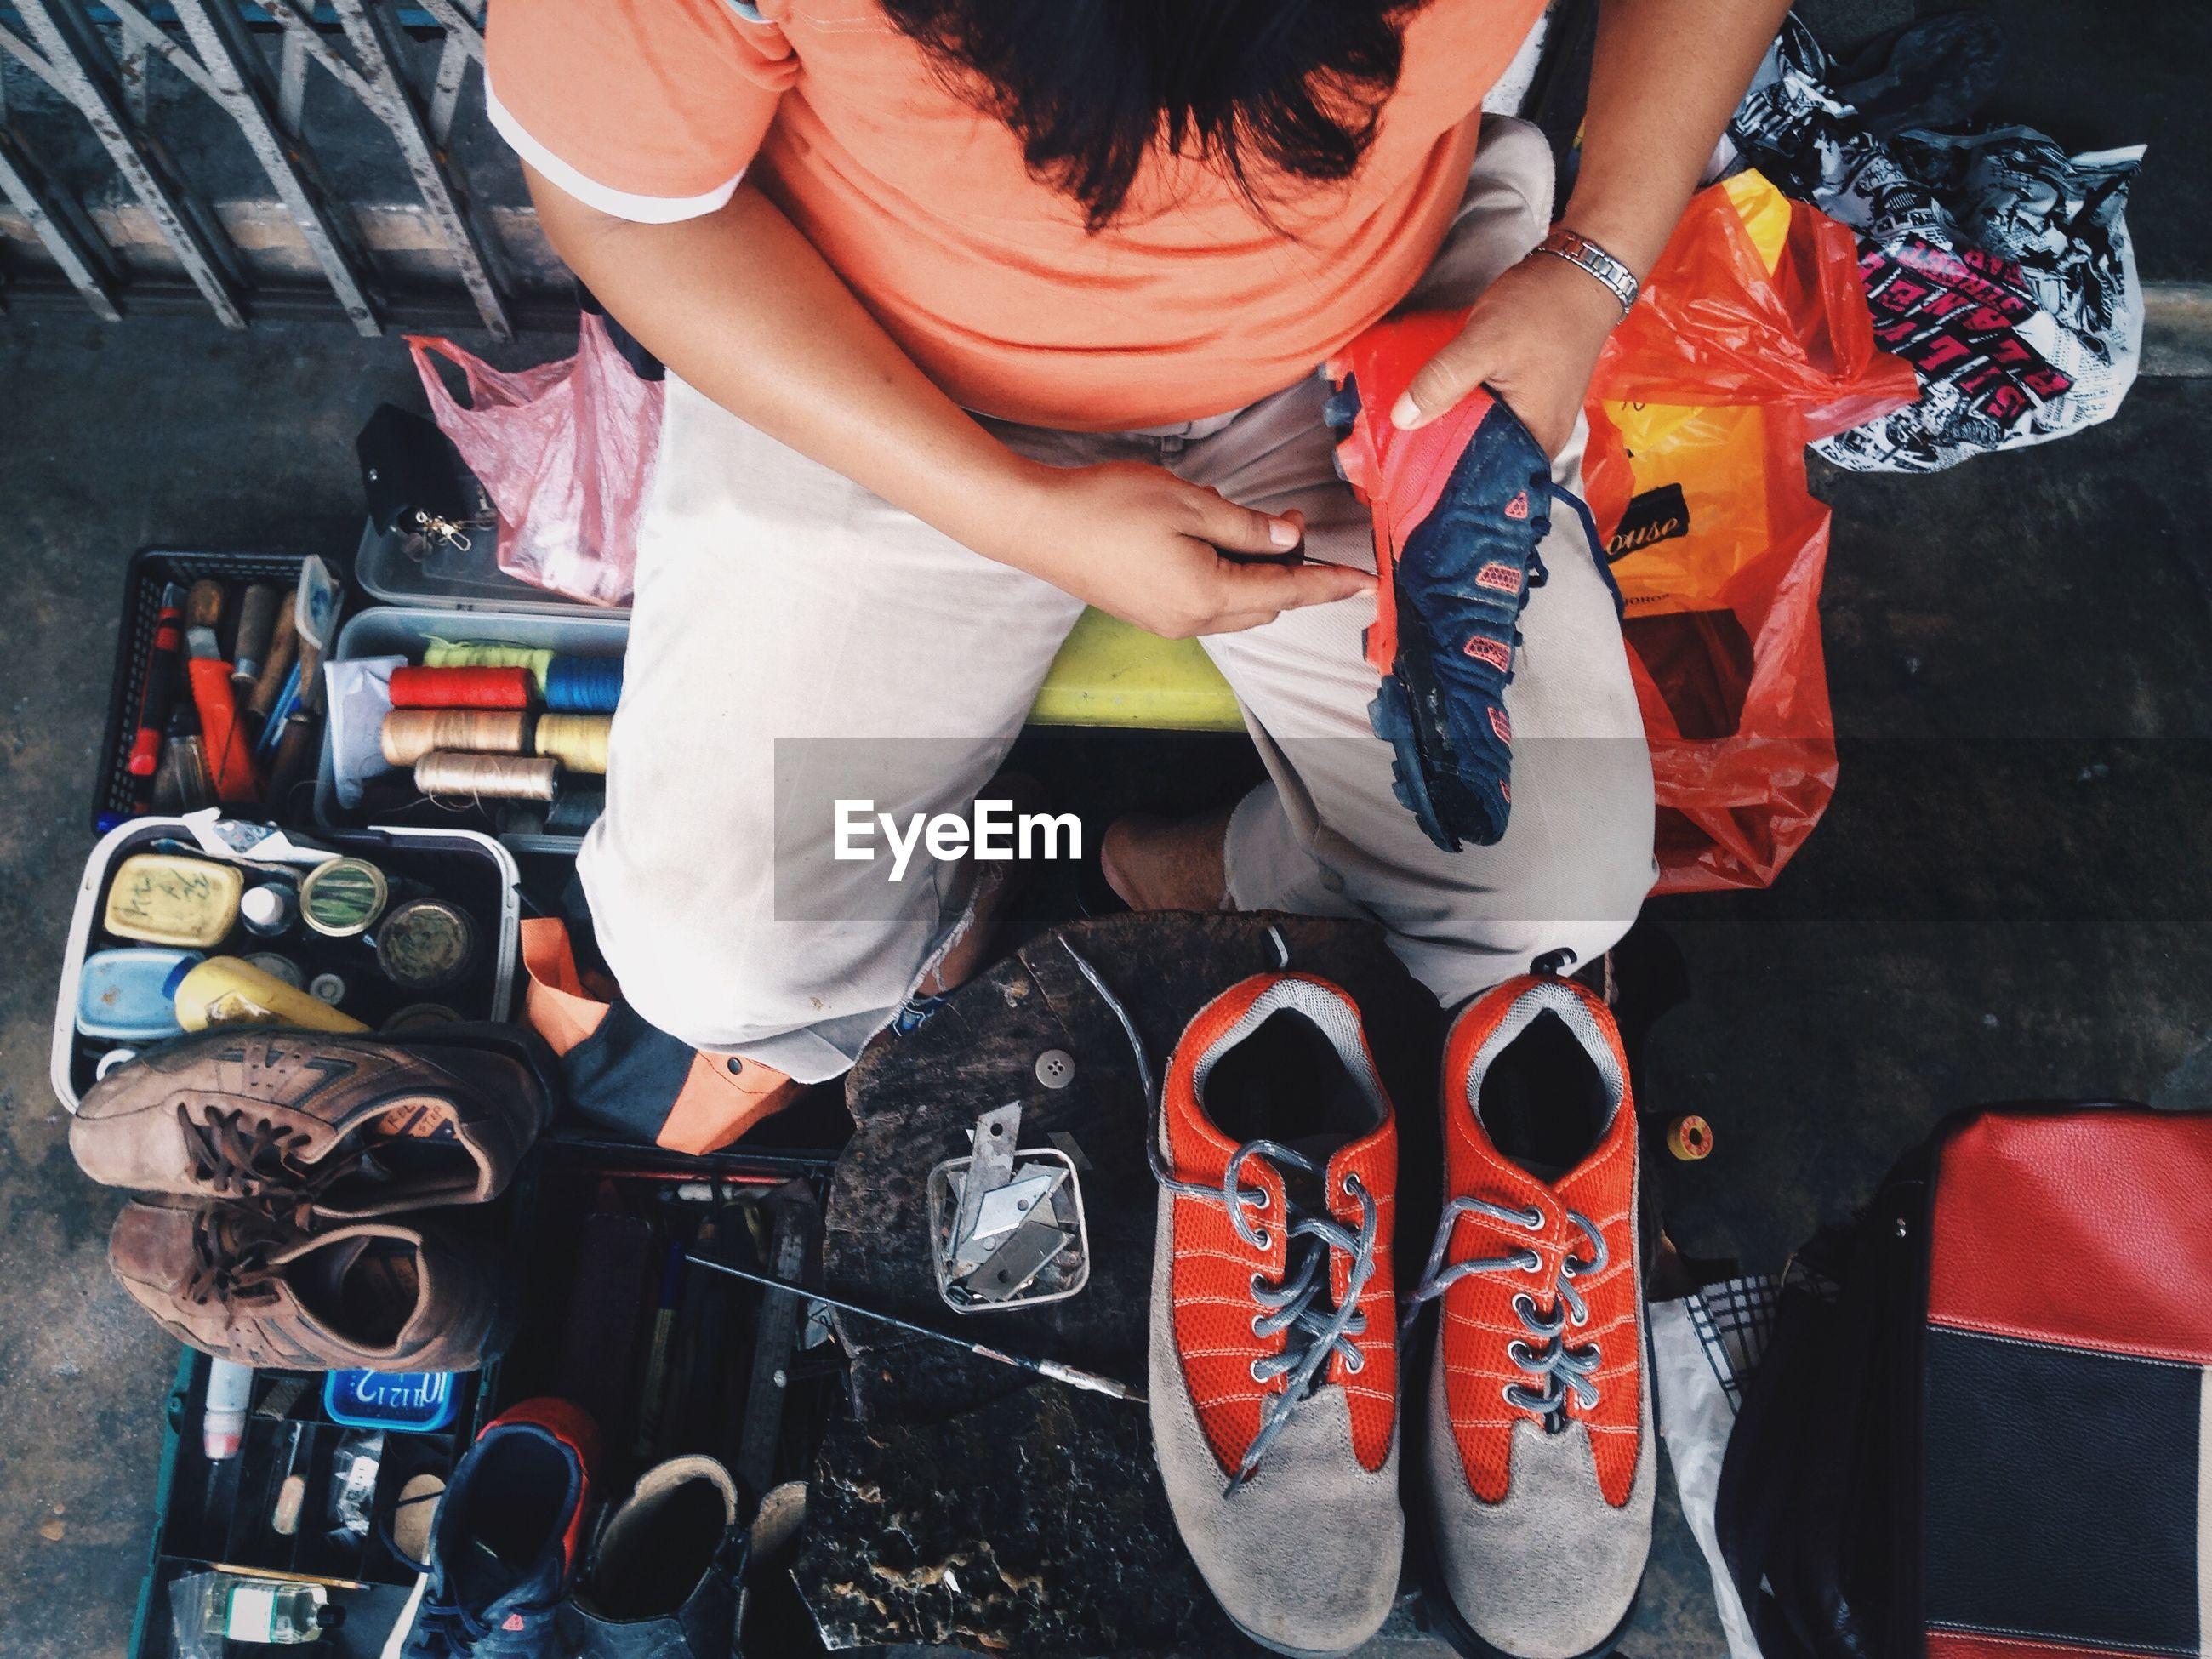 Directly above shot of man stitching shoe